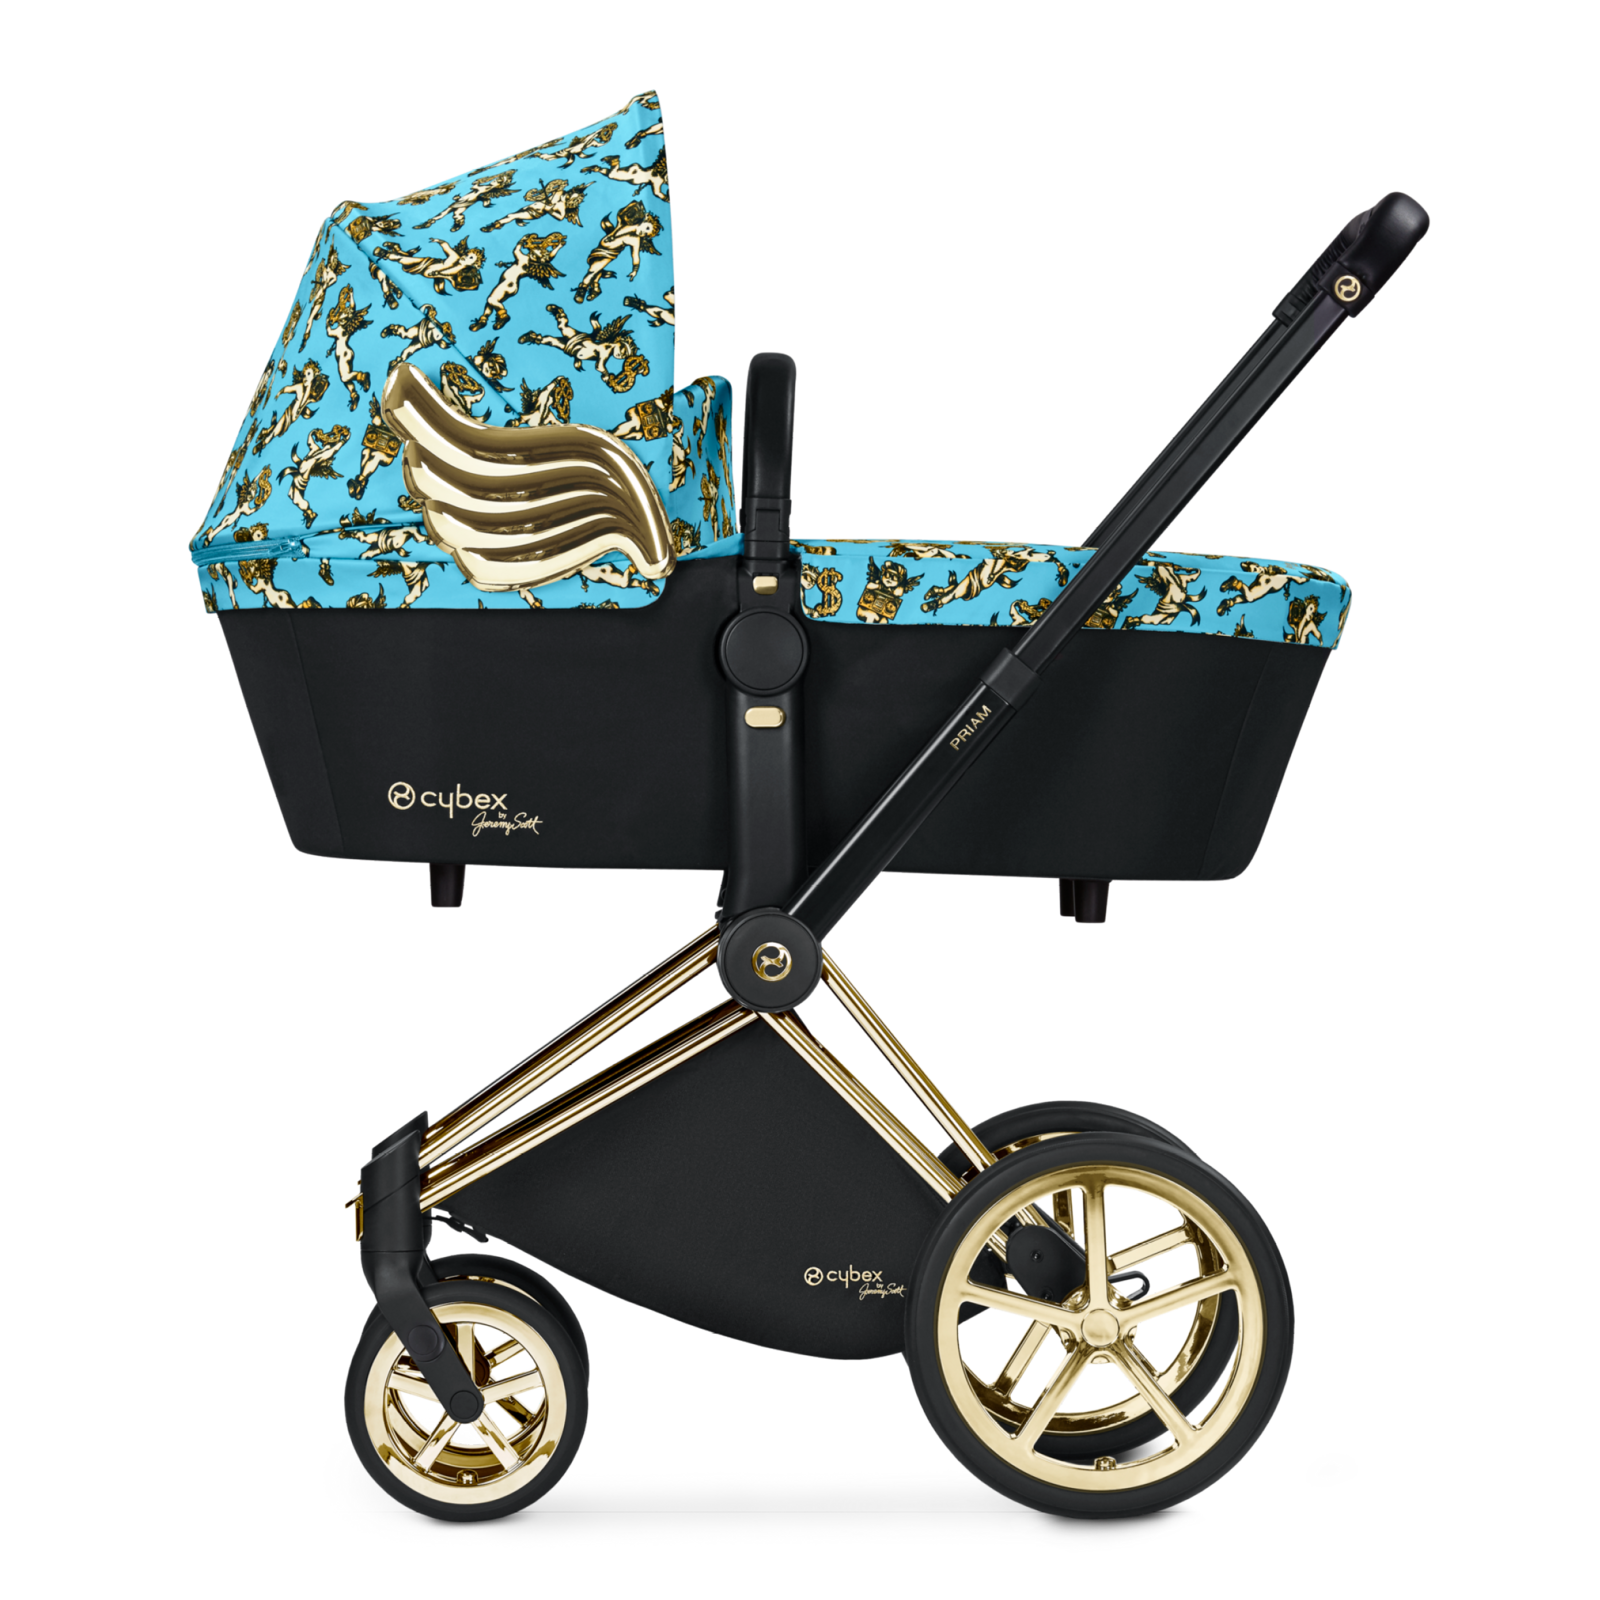 CYBEX by Jeremy Scott Fashion Collection Cybex stroller